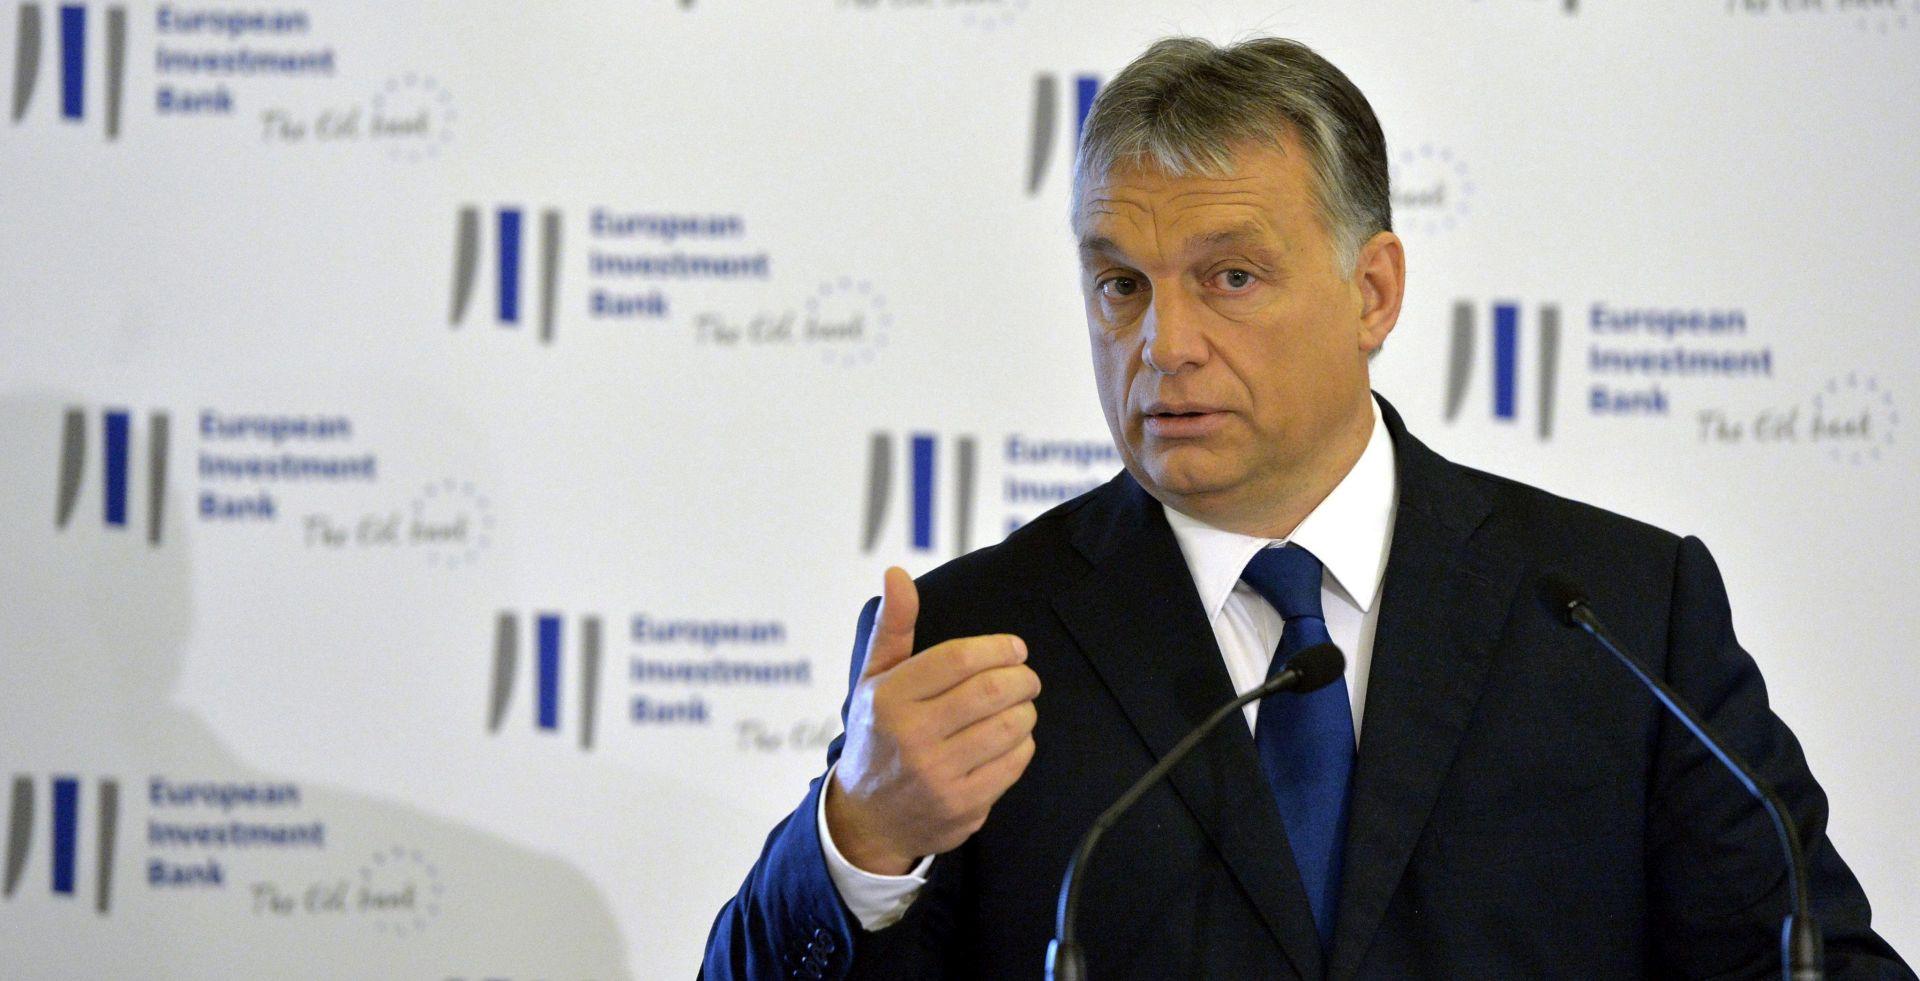 VIKTOR ORBAN: Posljednji poziv Mađarima da odbace europske migrantske kvote